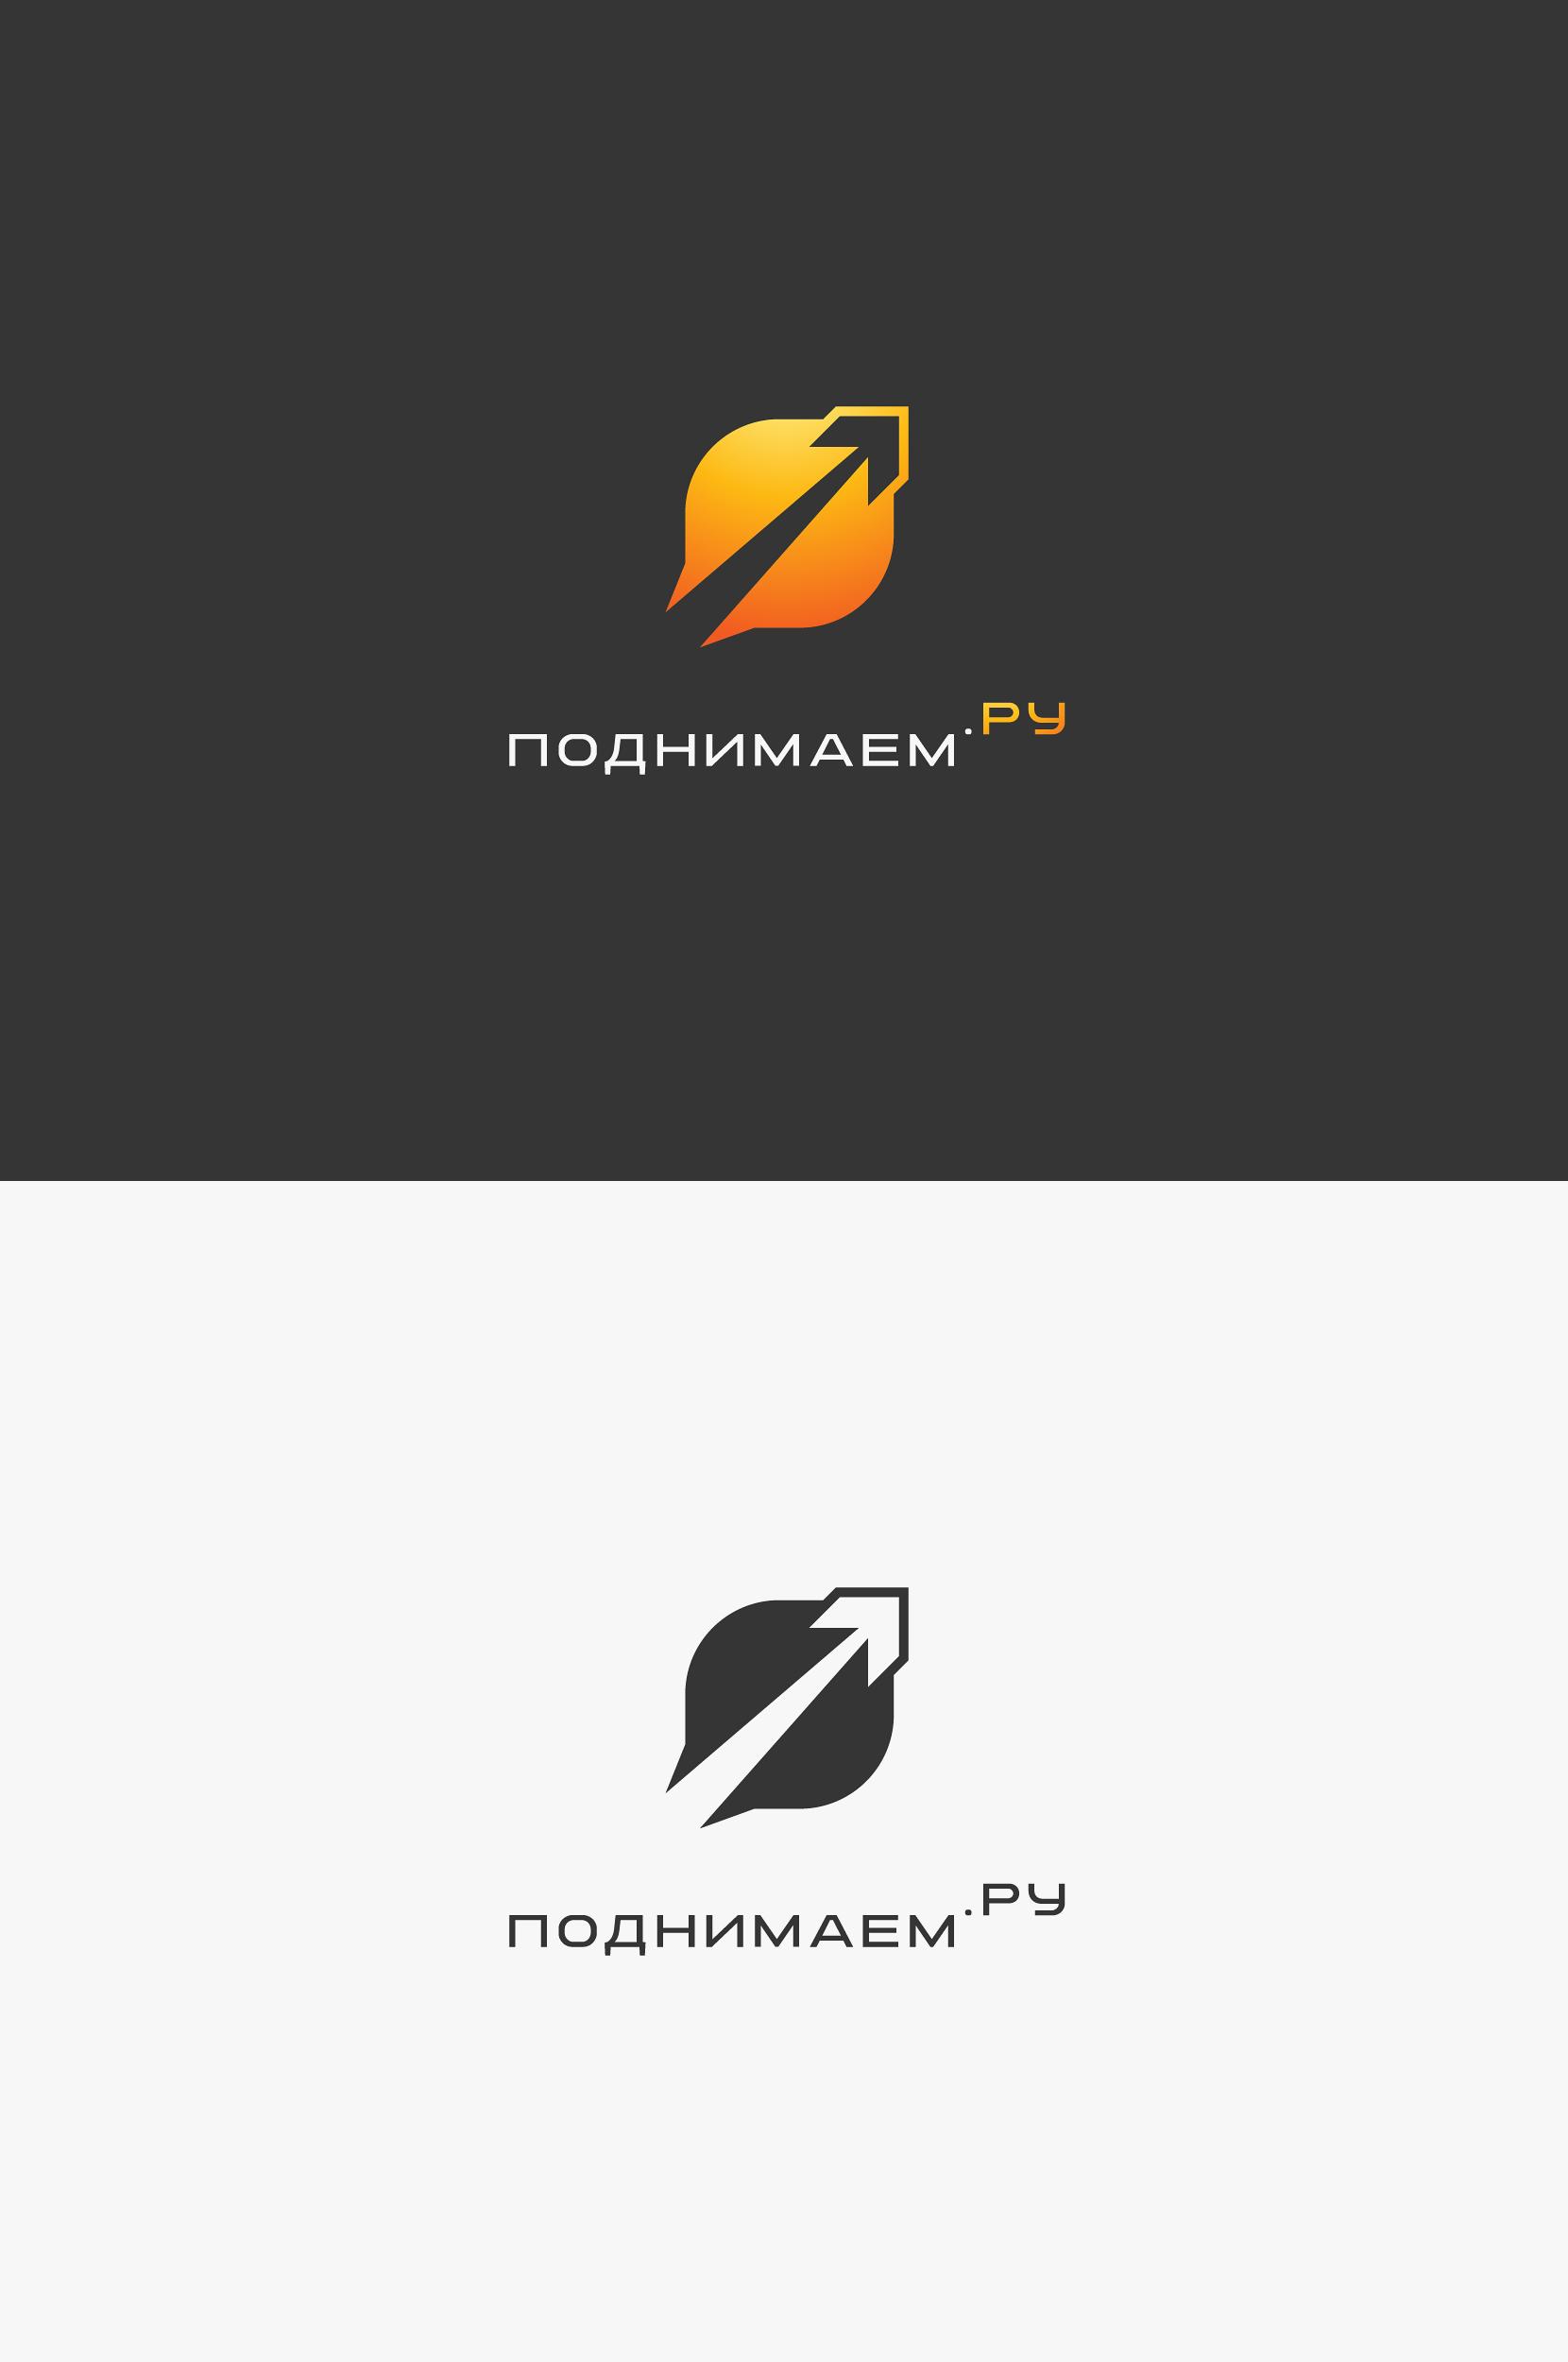 Разработать логотип + визитку + логотип для печати ООО +++ фото f_225554d8a0b84dfd.png